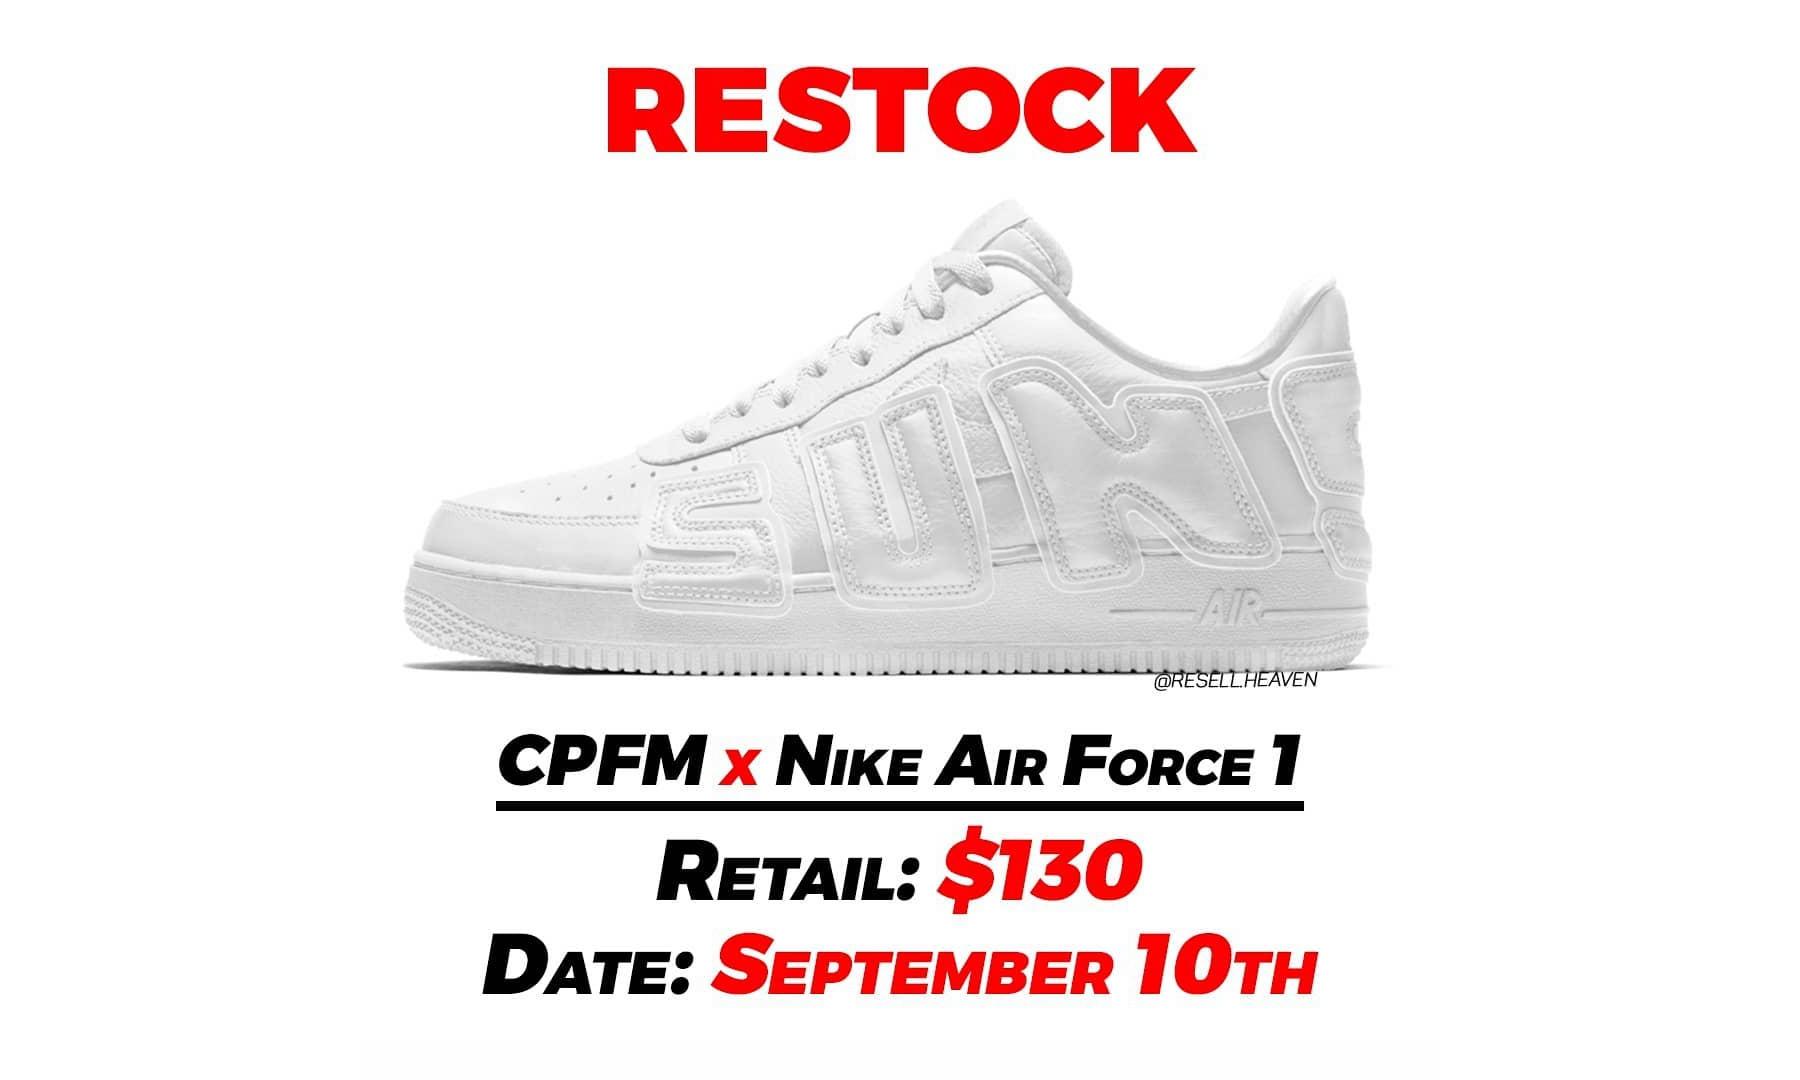 CPFM x Nike Air Force 1 补货将开启